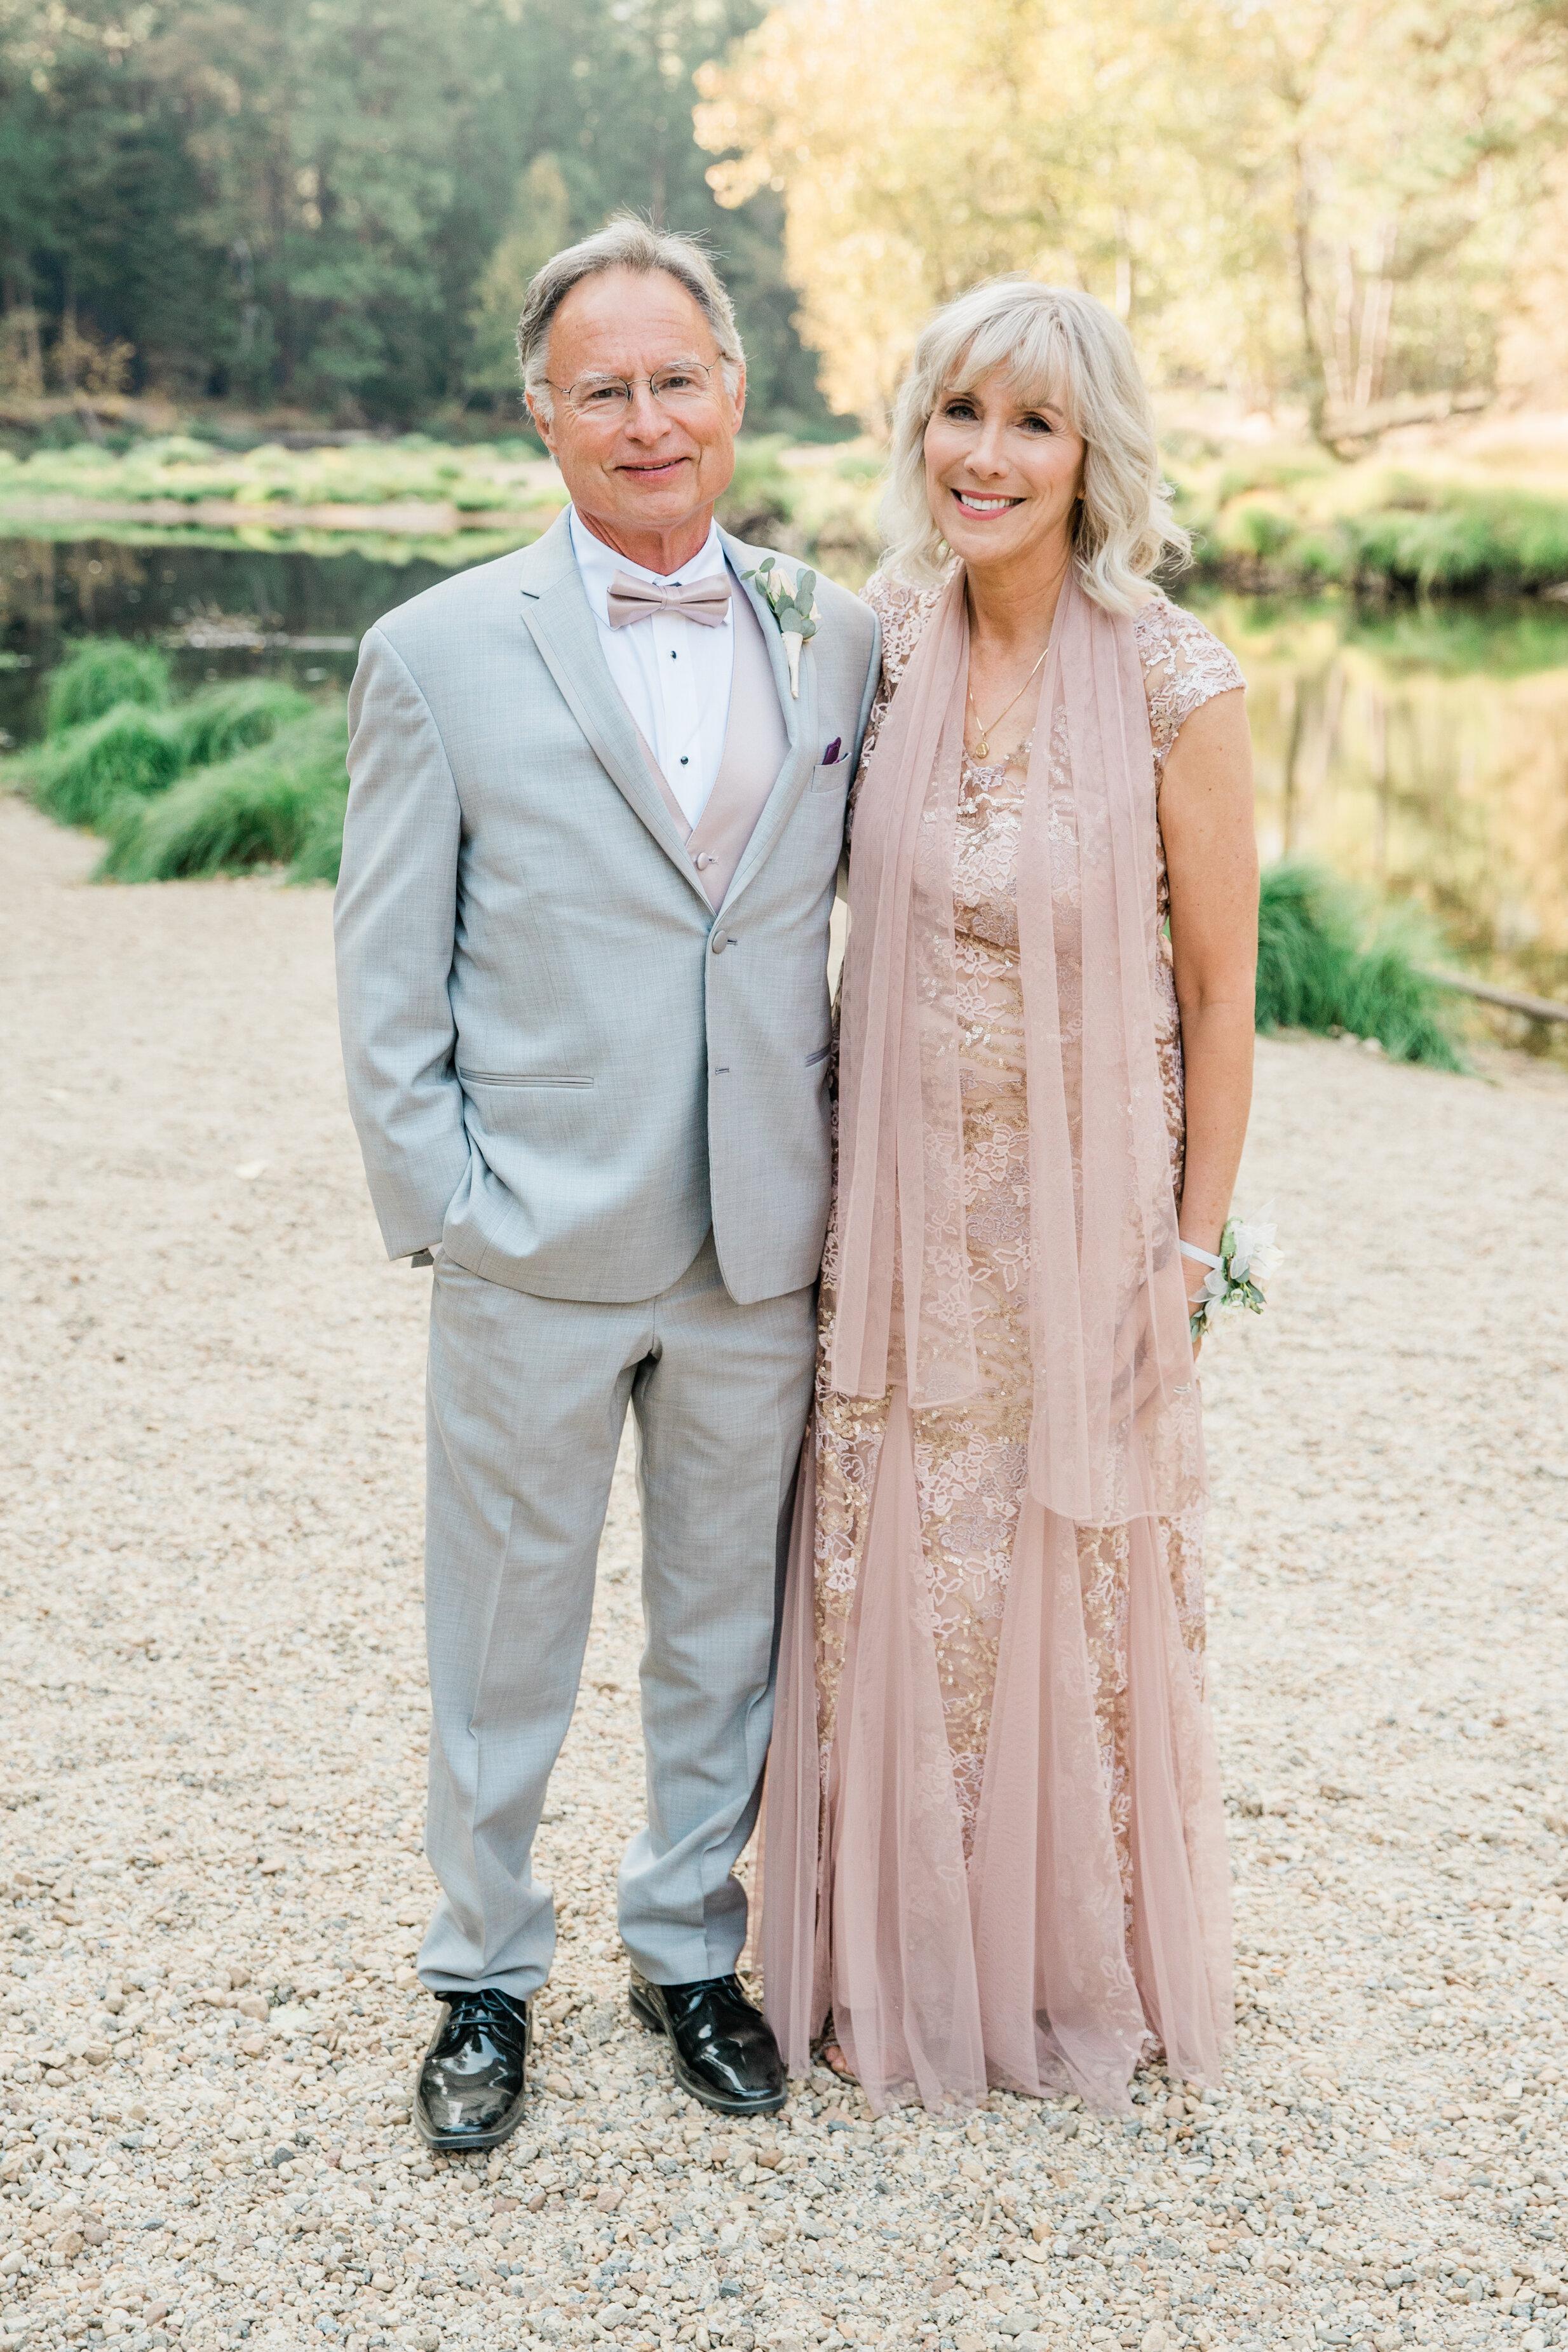 Leanne and Joe - Married - Sneak Peeks - Lauren Alisse Photography-21.jpg